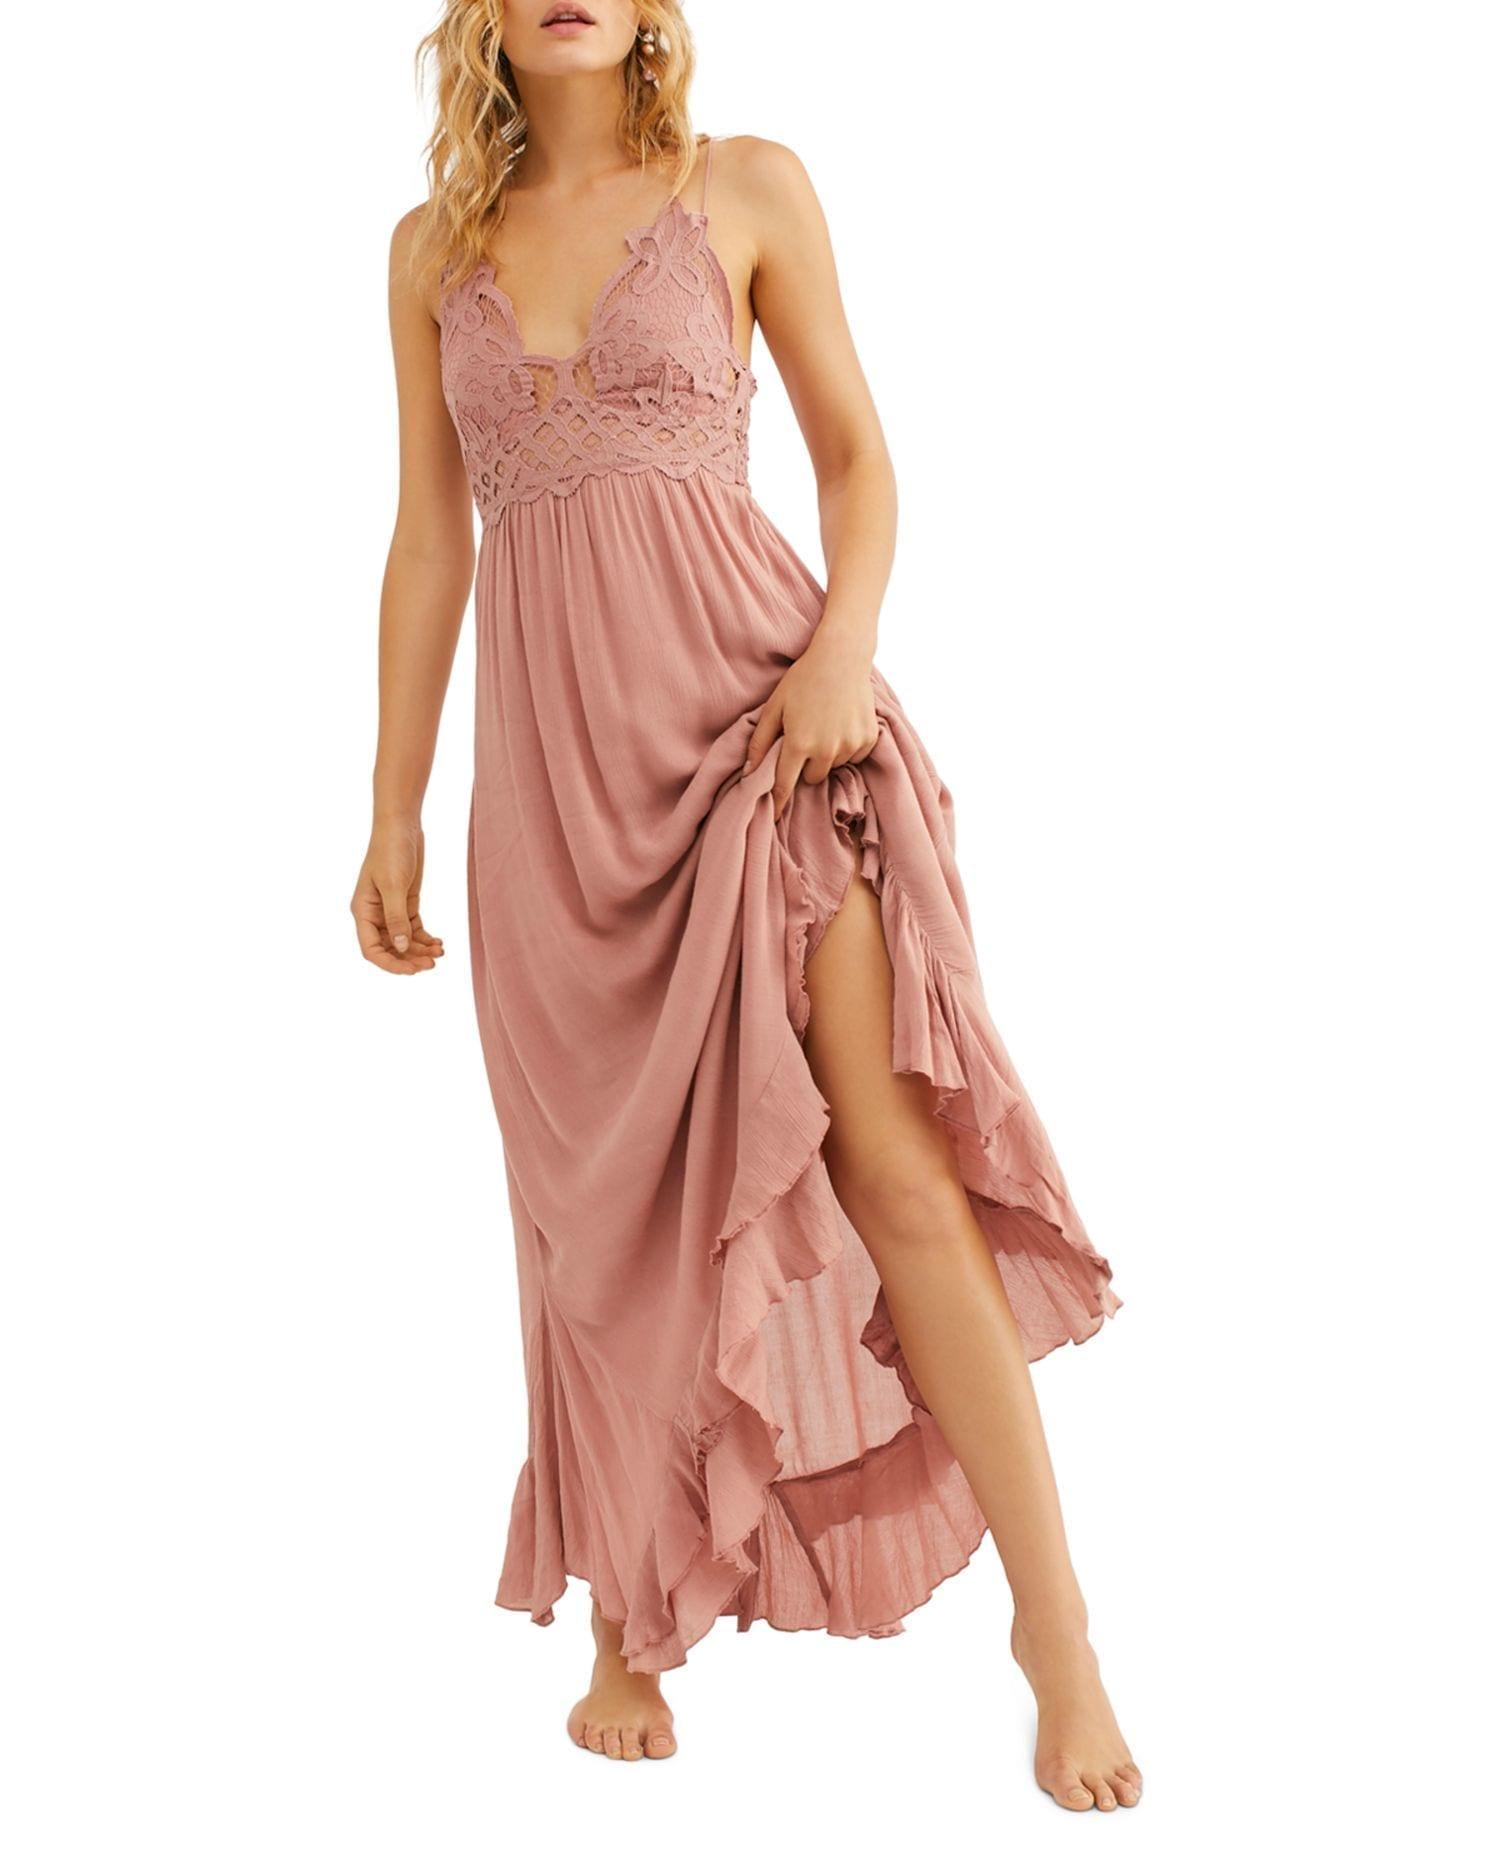 FREE PEOPLE Adella Lace-Trim Maxi Dress